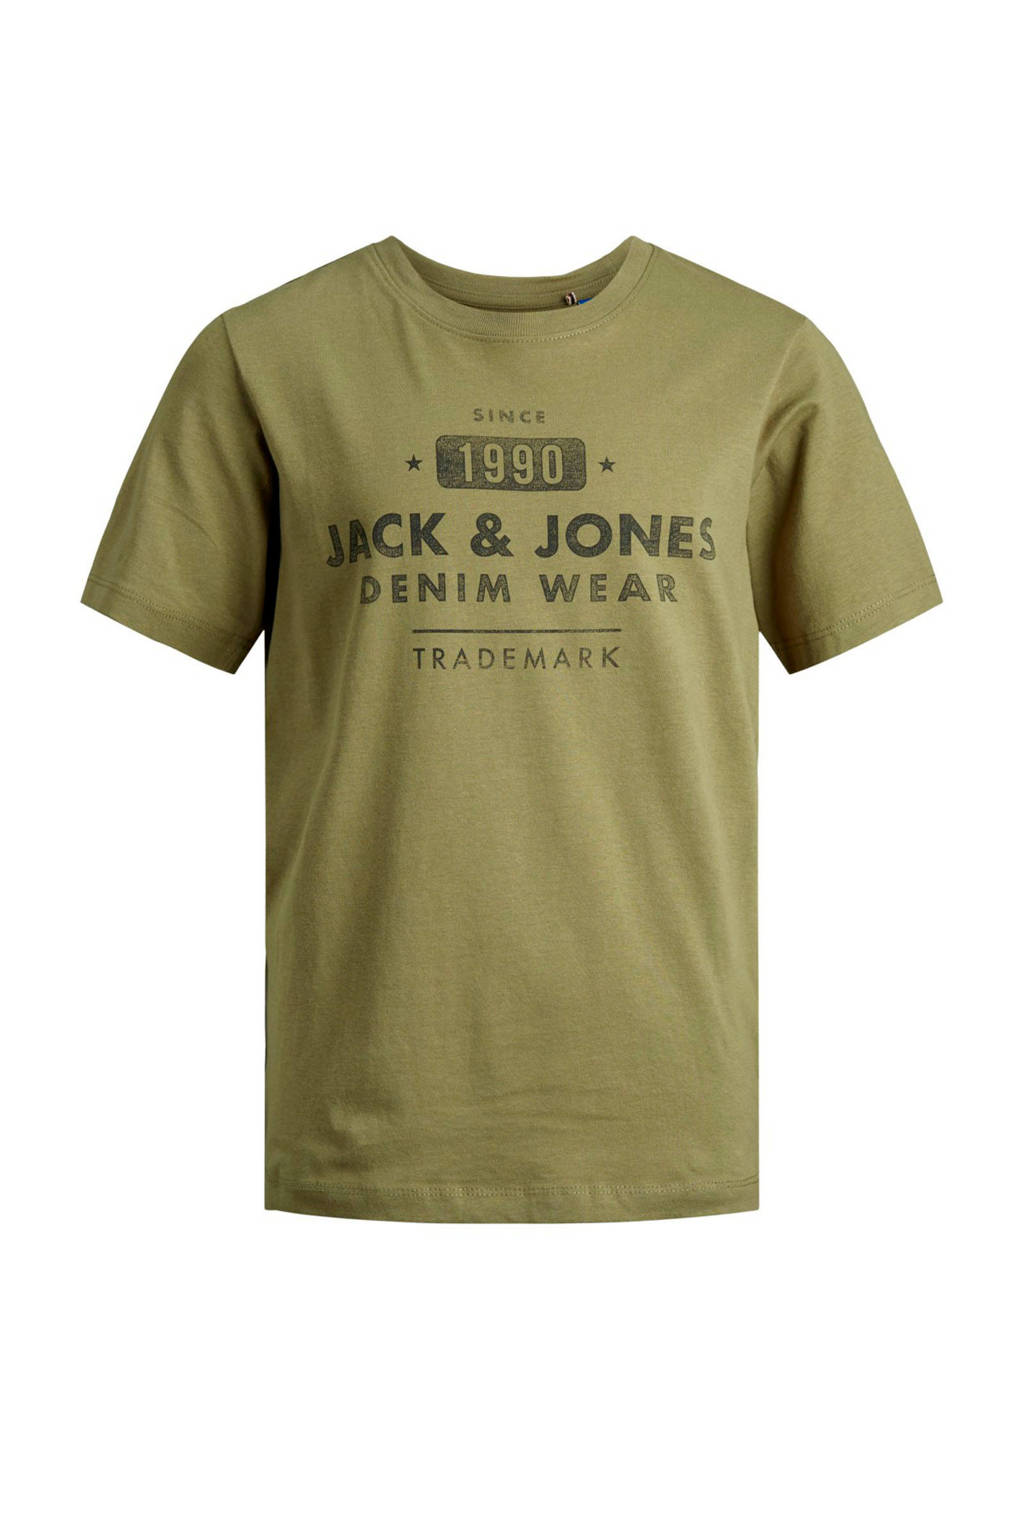 JACK & JONES JUNIOR T-shirt Jeans met printopdruk donkergroen, Donkergroen